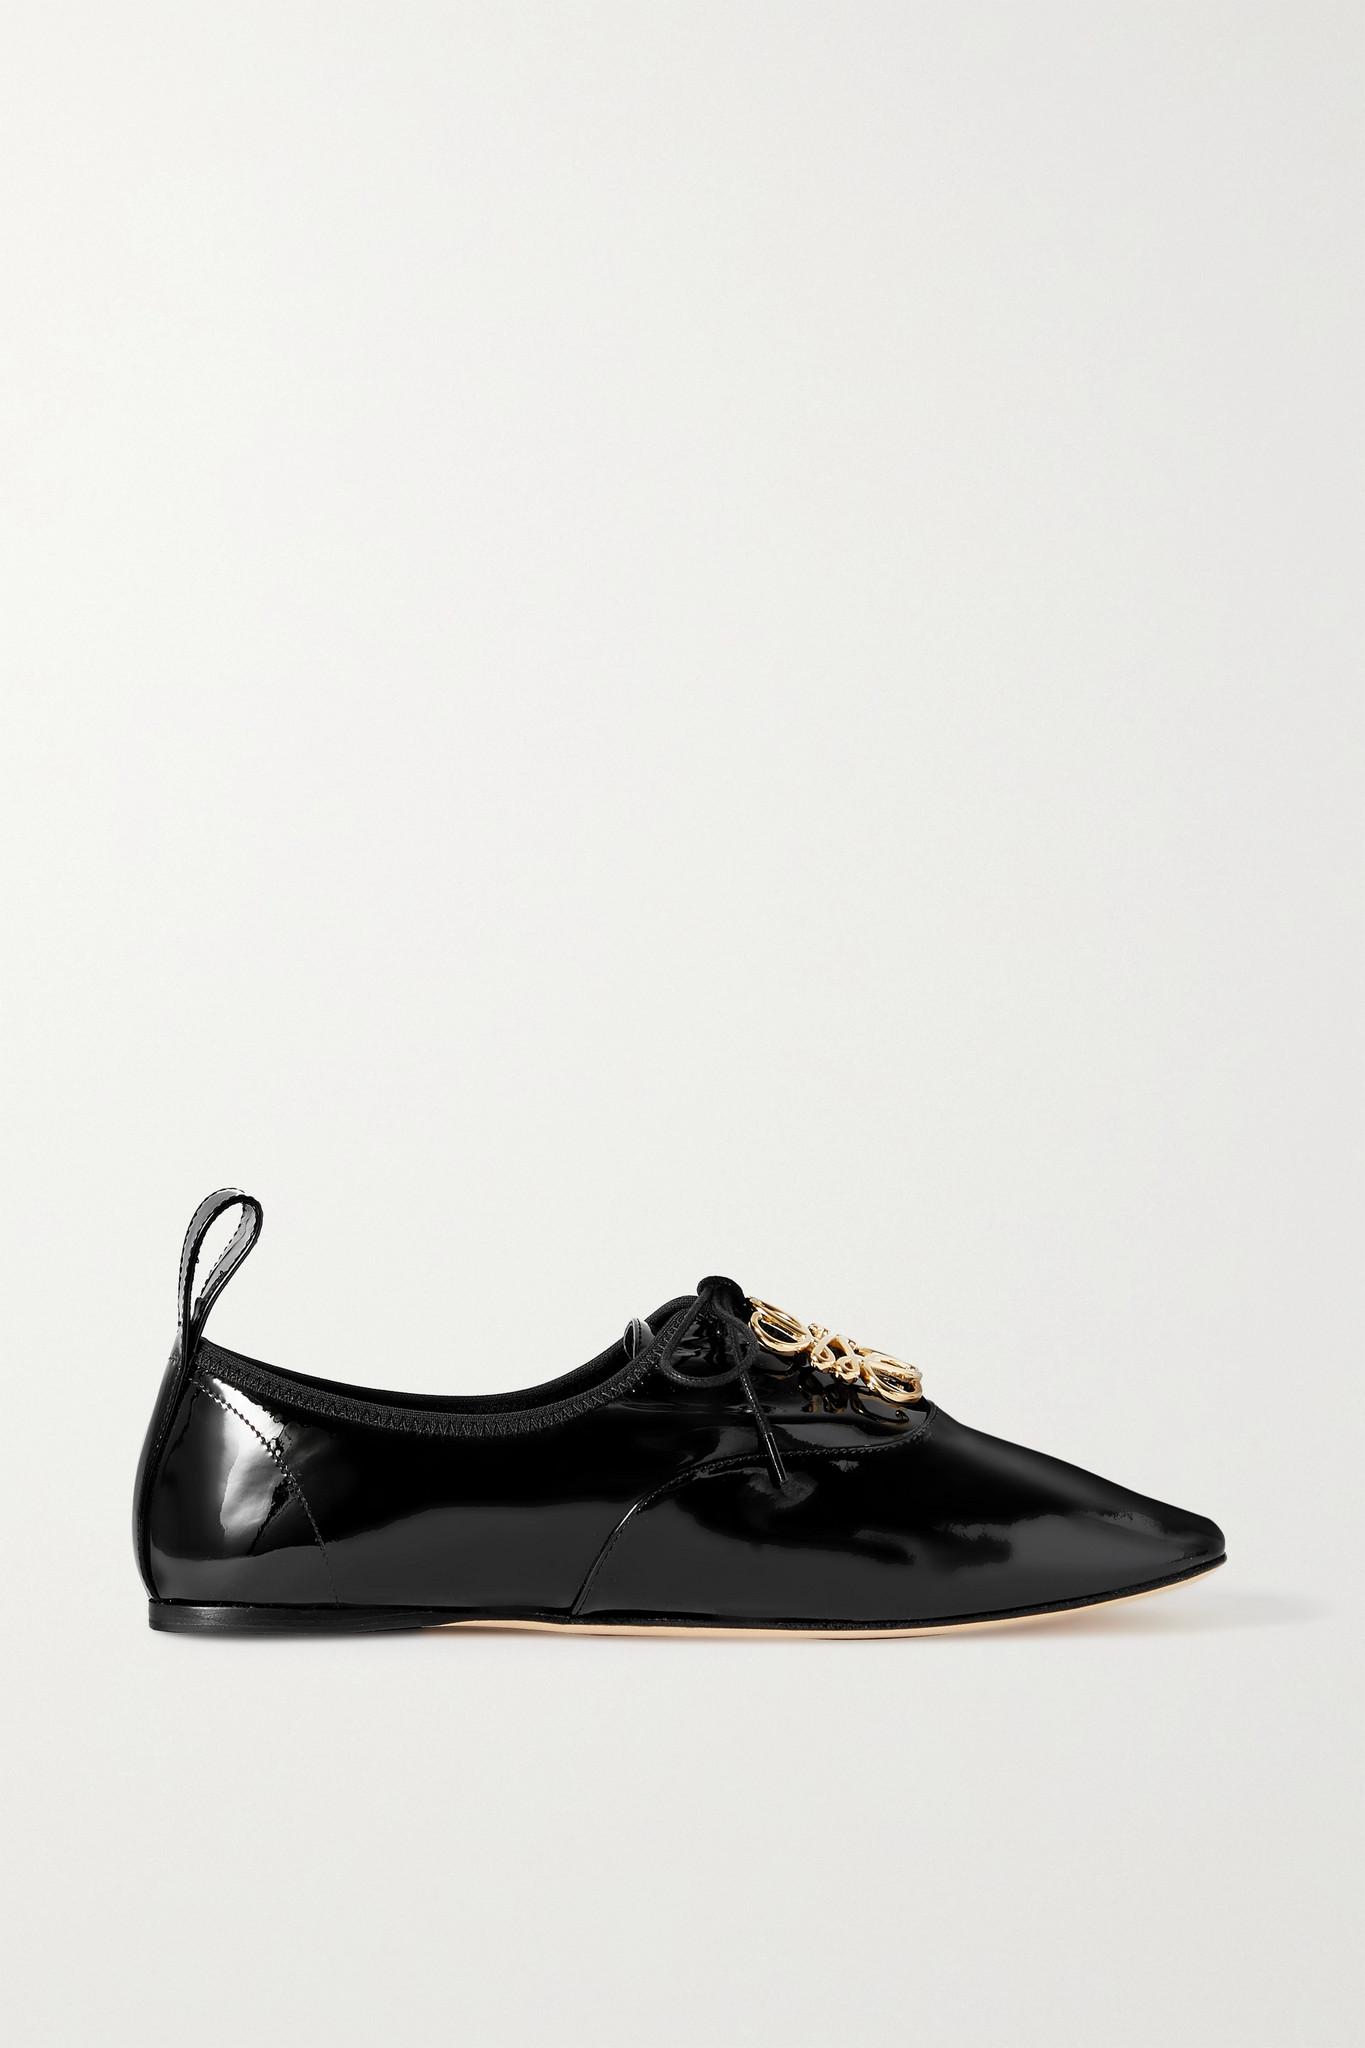 LOEWE - 品牌标志缀饰漆皮芭蕾平底鞋 - 黑色 - IT41